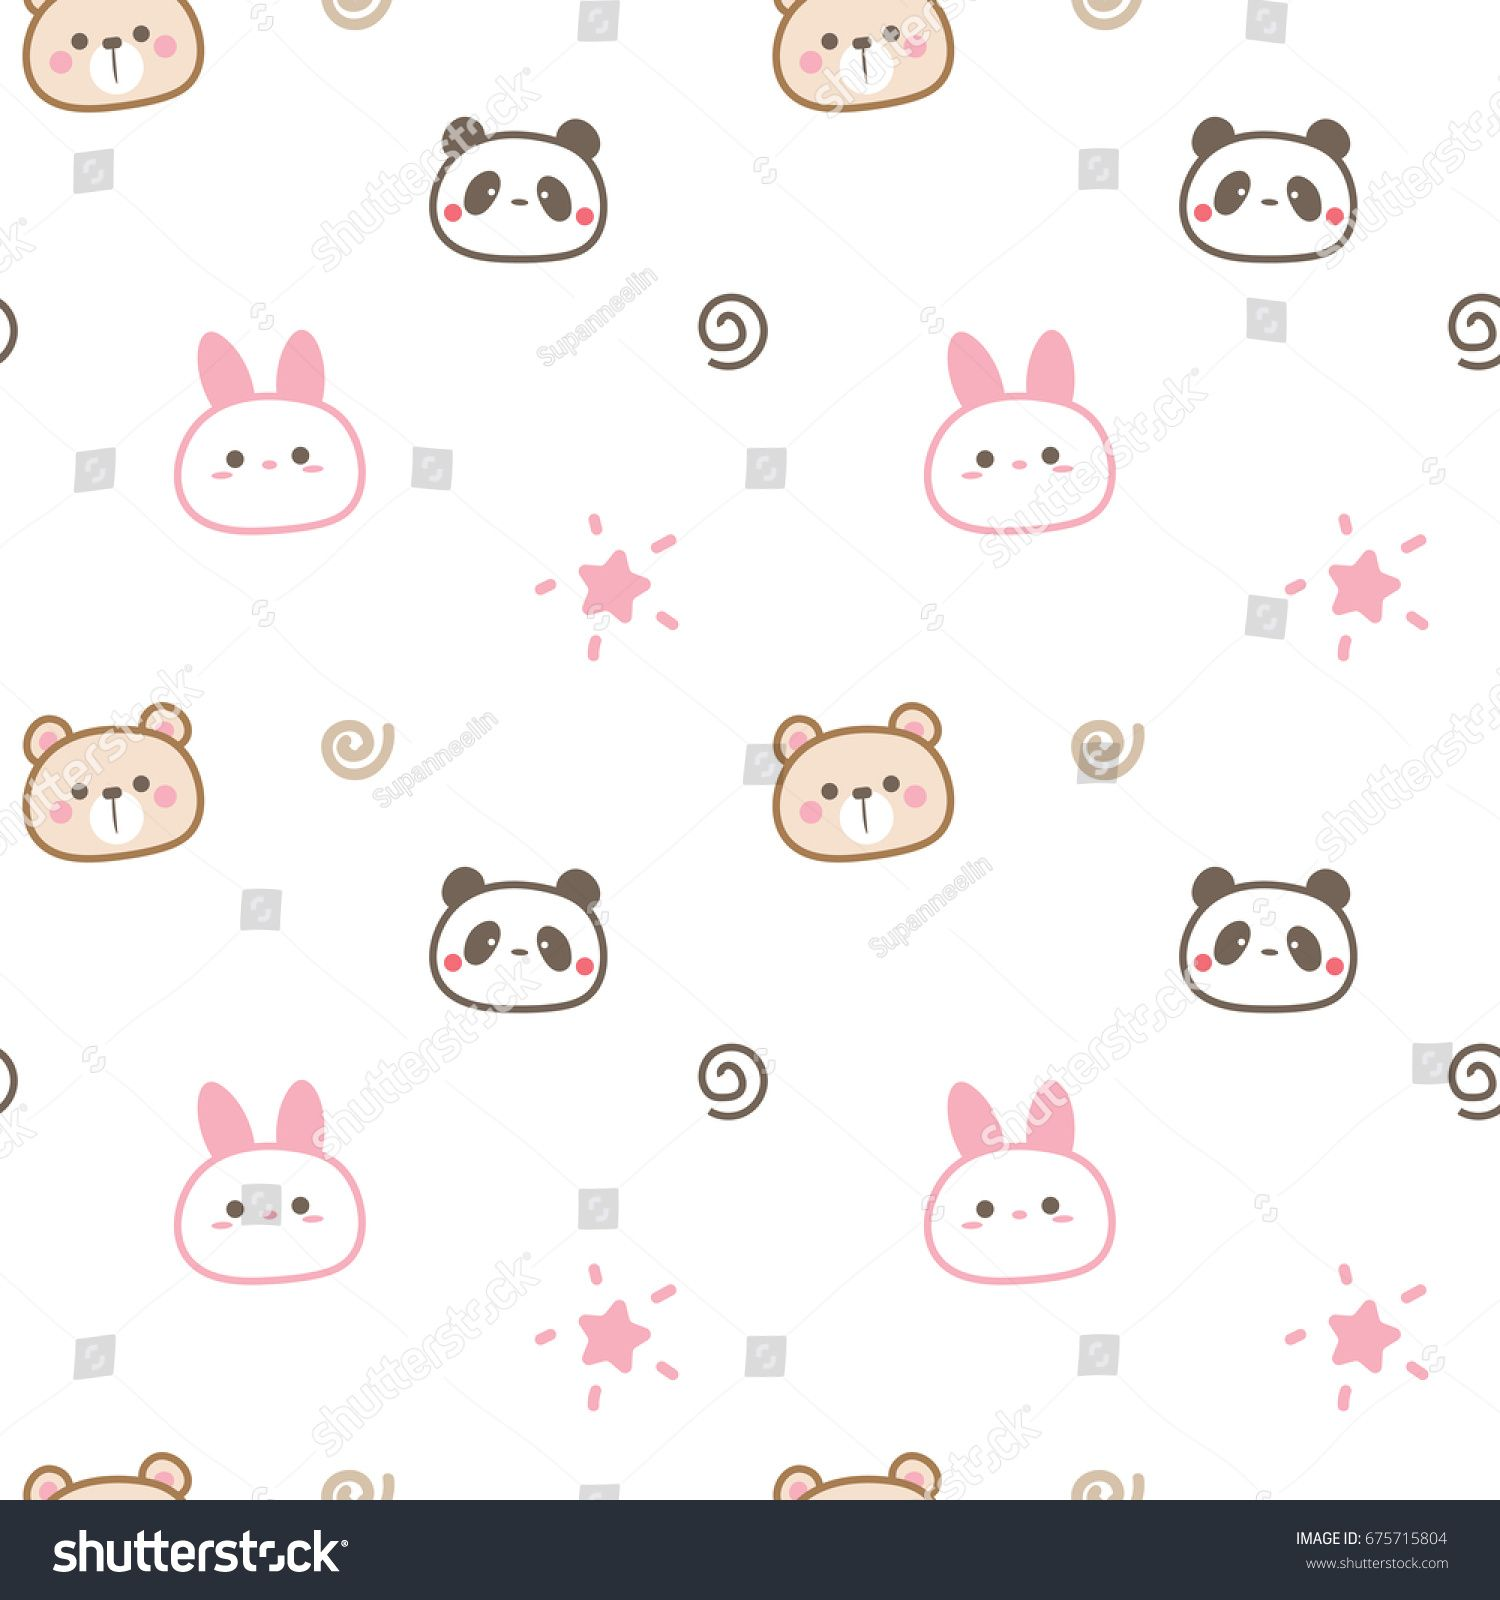 Seamless Pattern Of Cute Cartoon Animal Head White